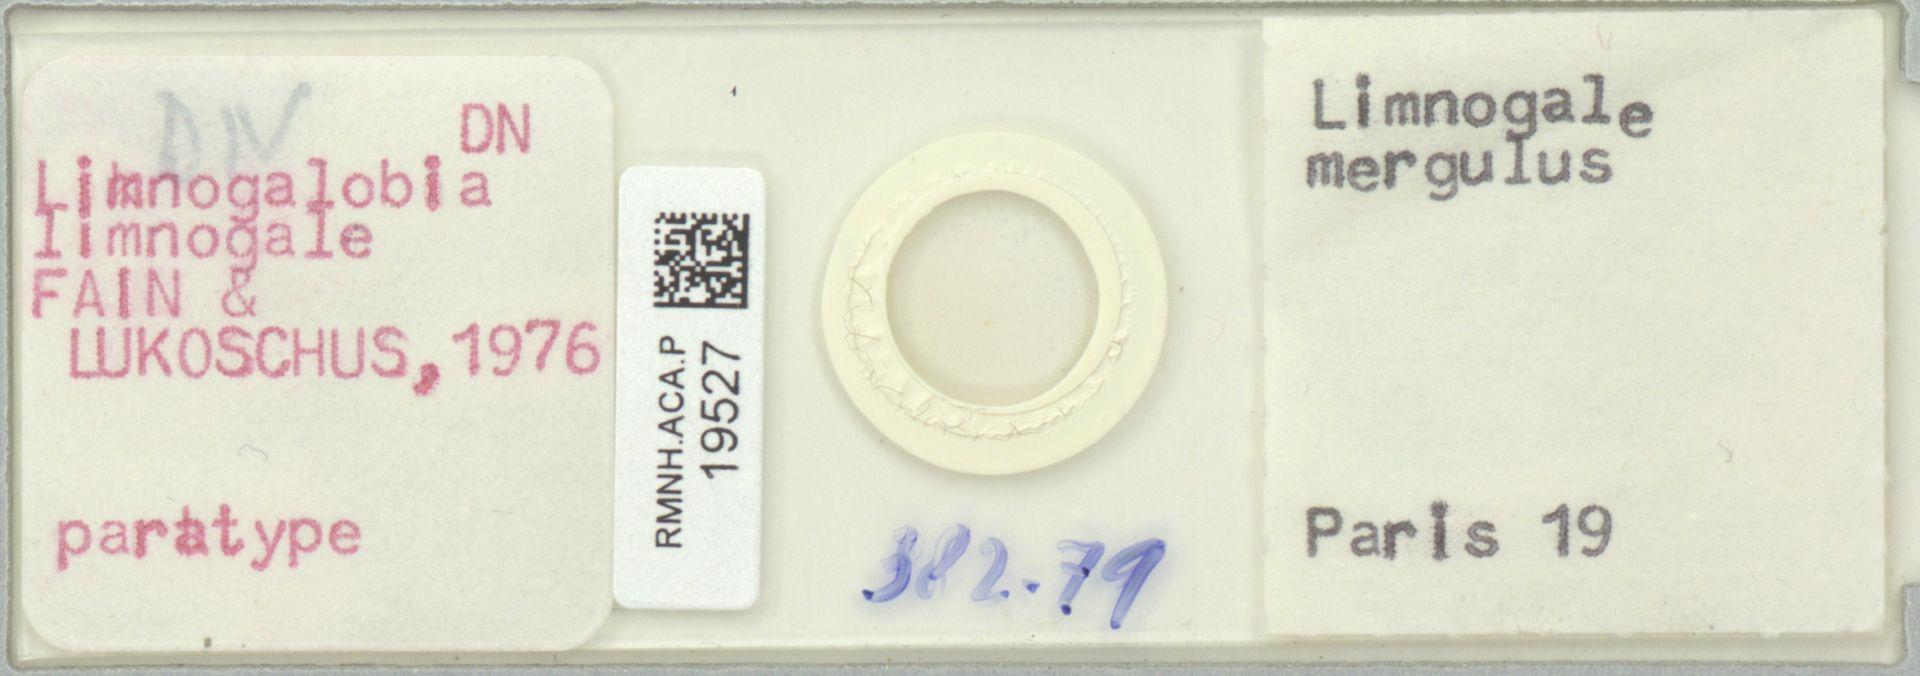 RMNH.ACA.P.19527 | Limnogalobia limnogale